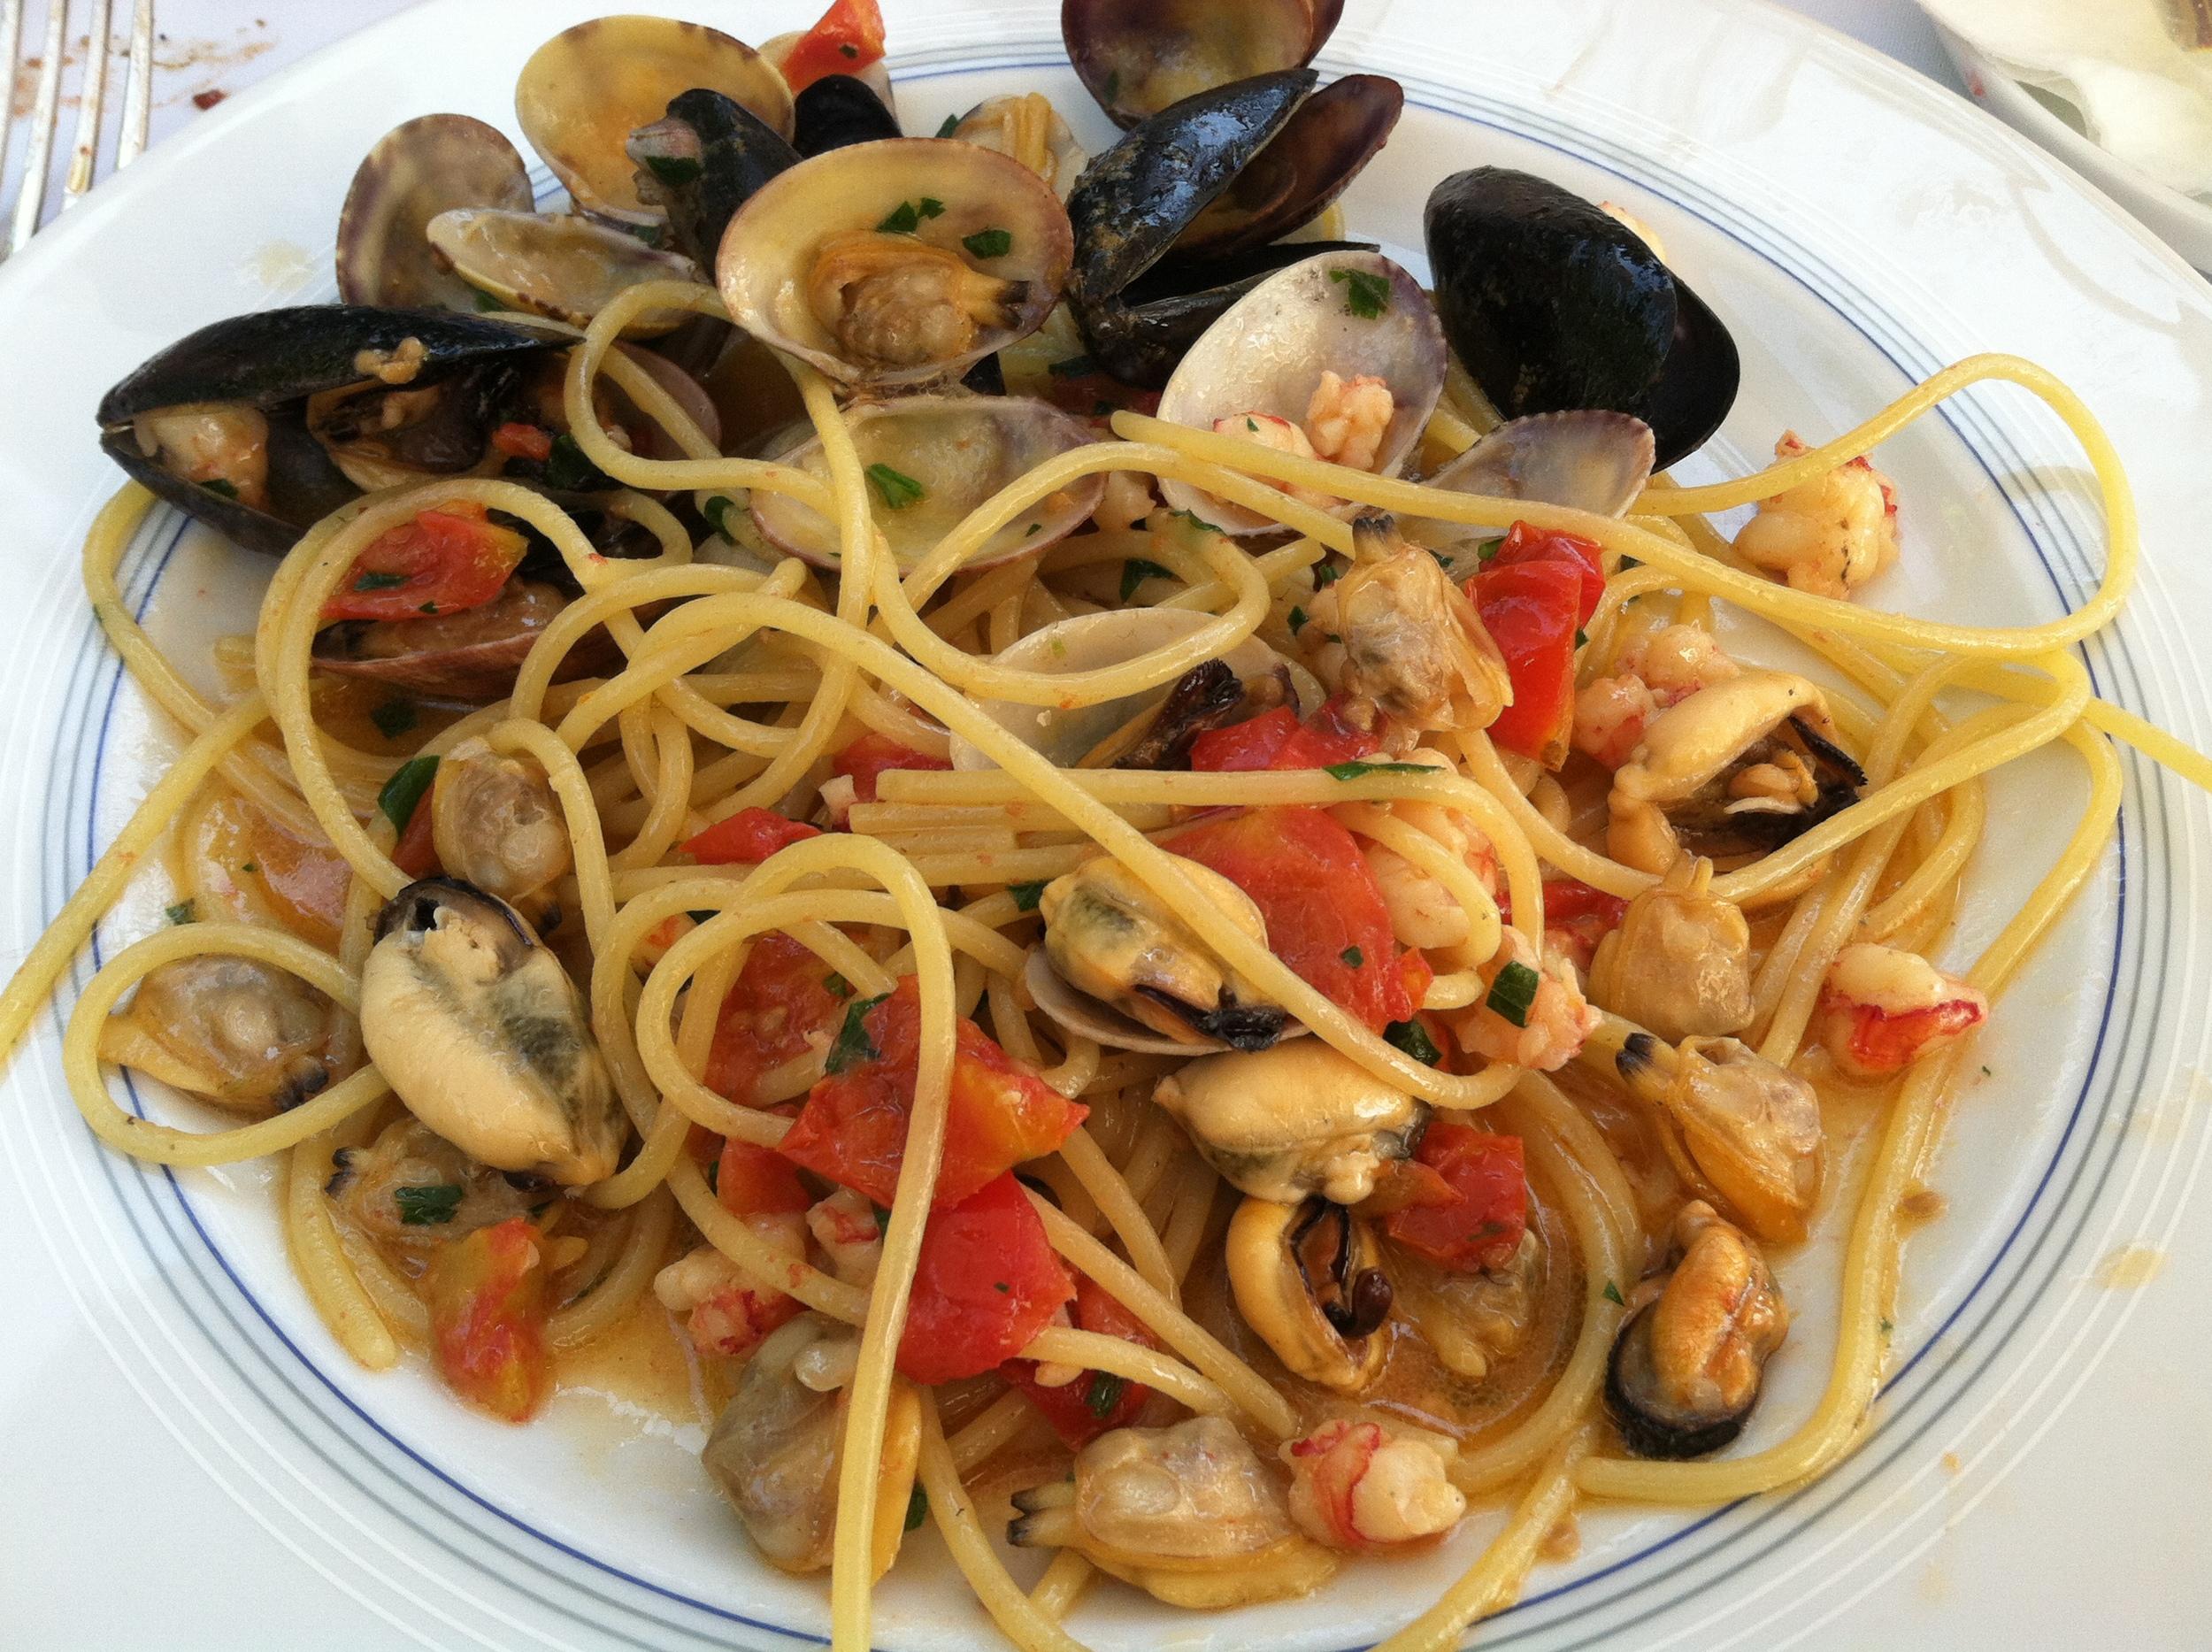 Poolside pasta at hotel La Scalinatella